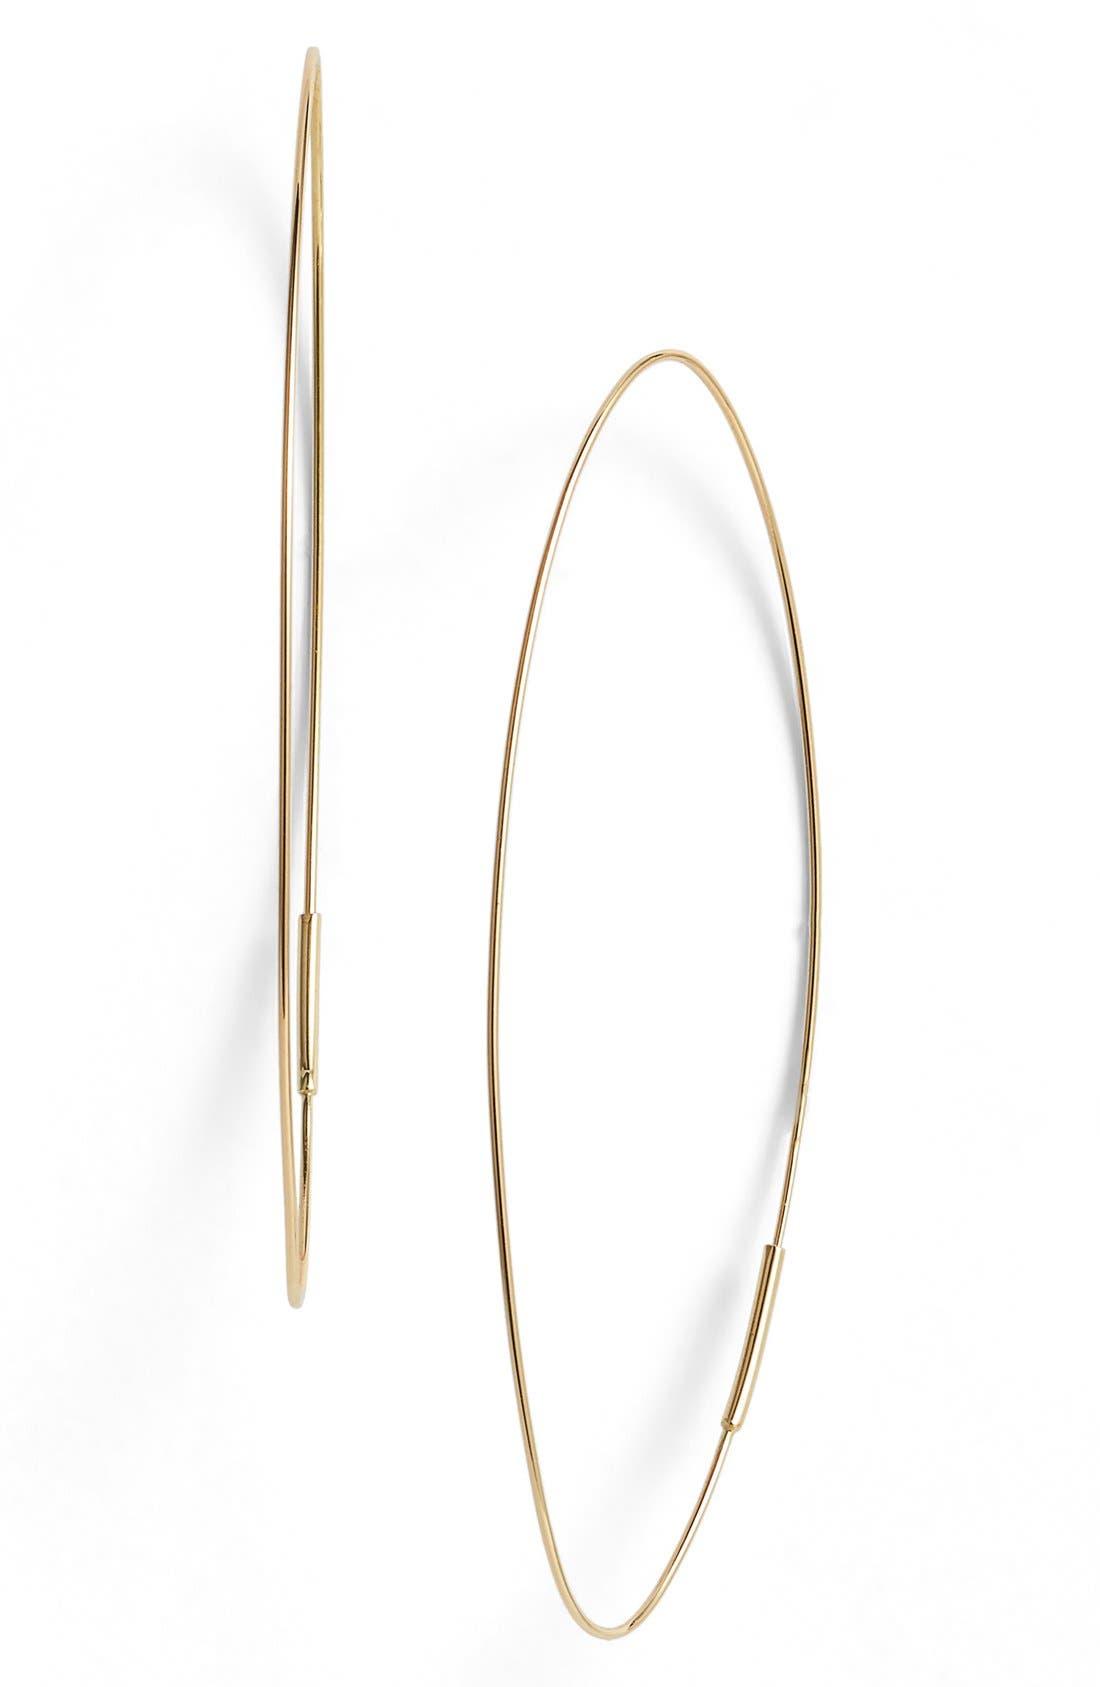 'Magic' Large Oval Hoop Earrings,                             Main thumbnail 1, color,                             YELLOW GOLD